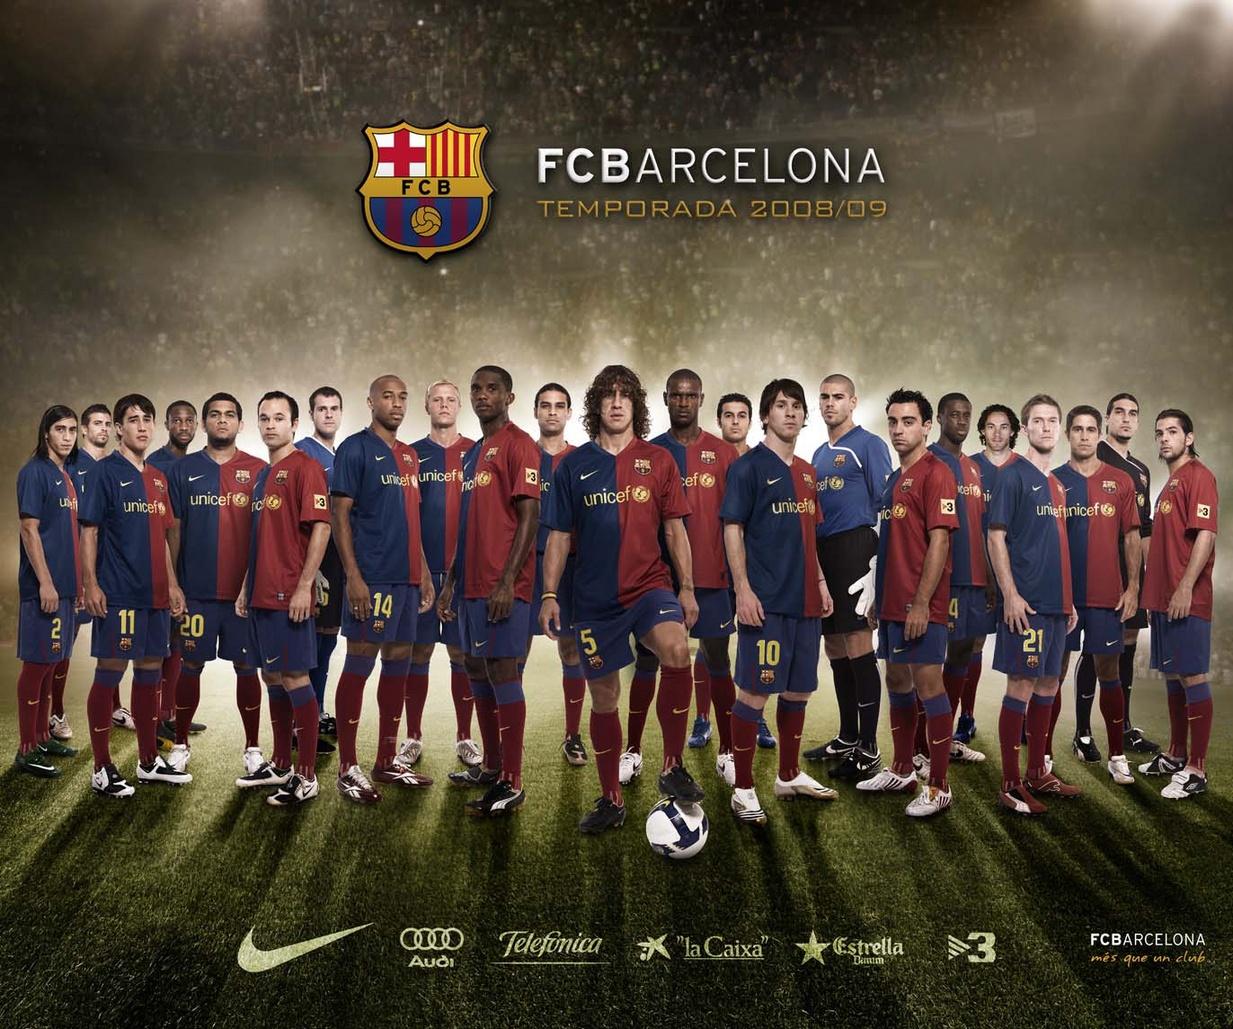 barcelona football blog Photo